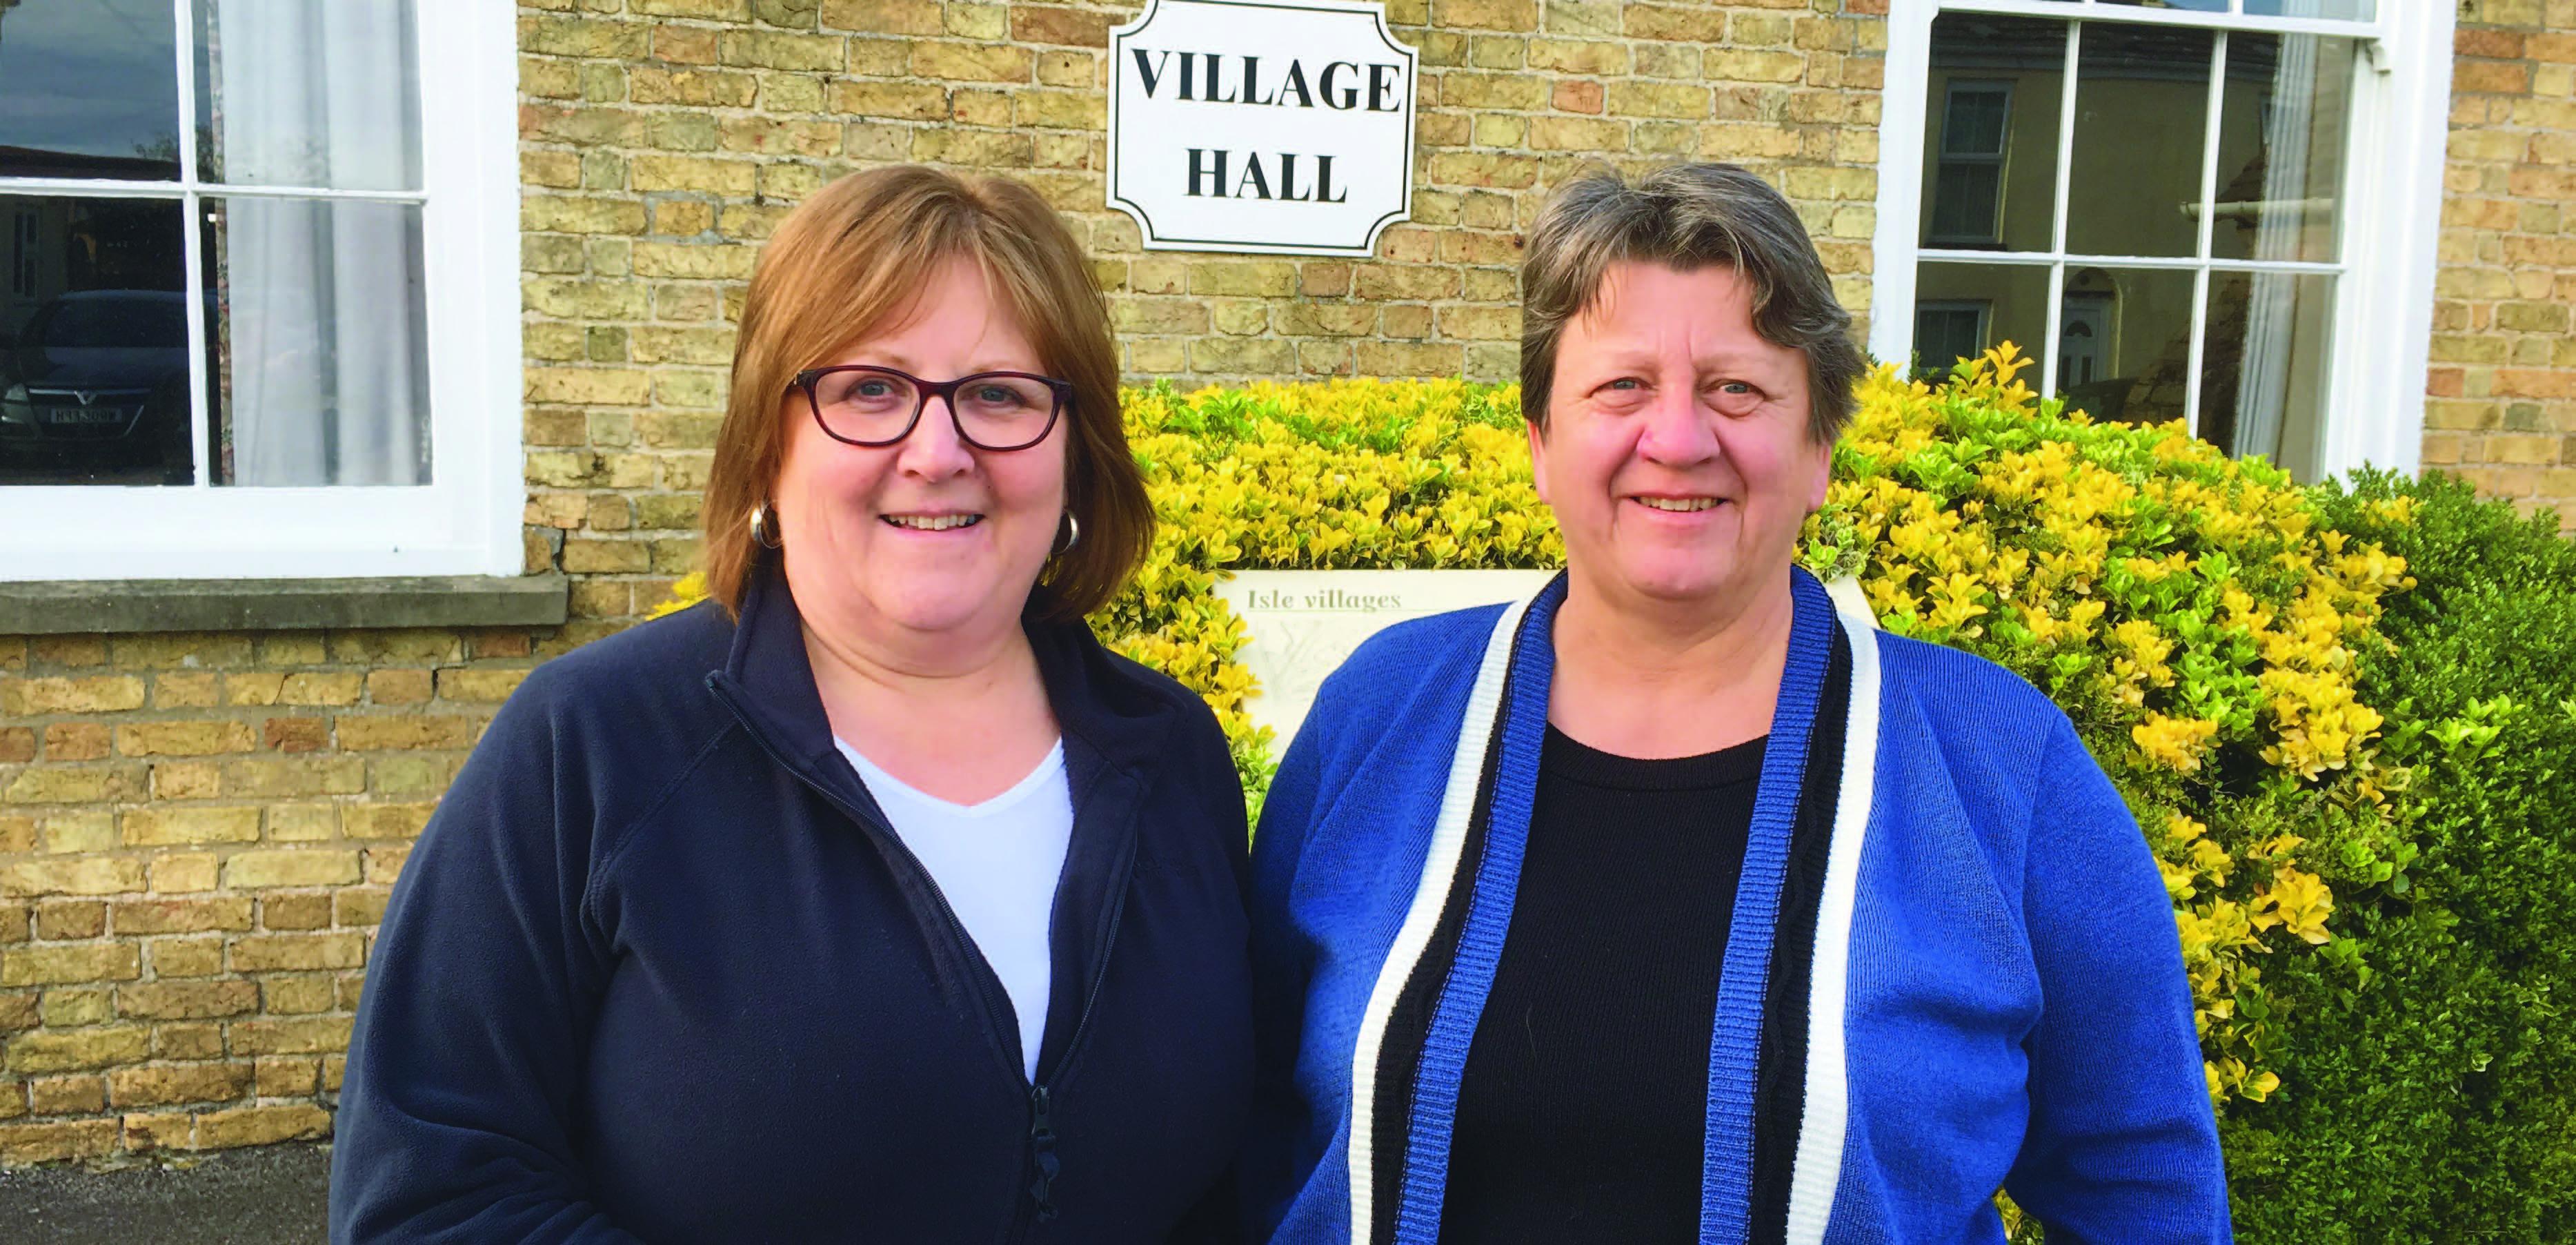 Doris Benke - Lib Dem candidate for Downham Villages